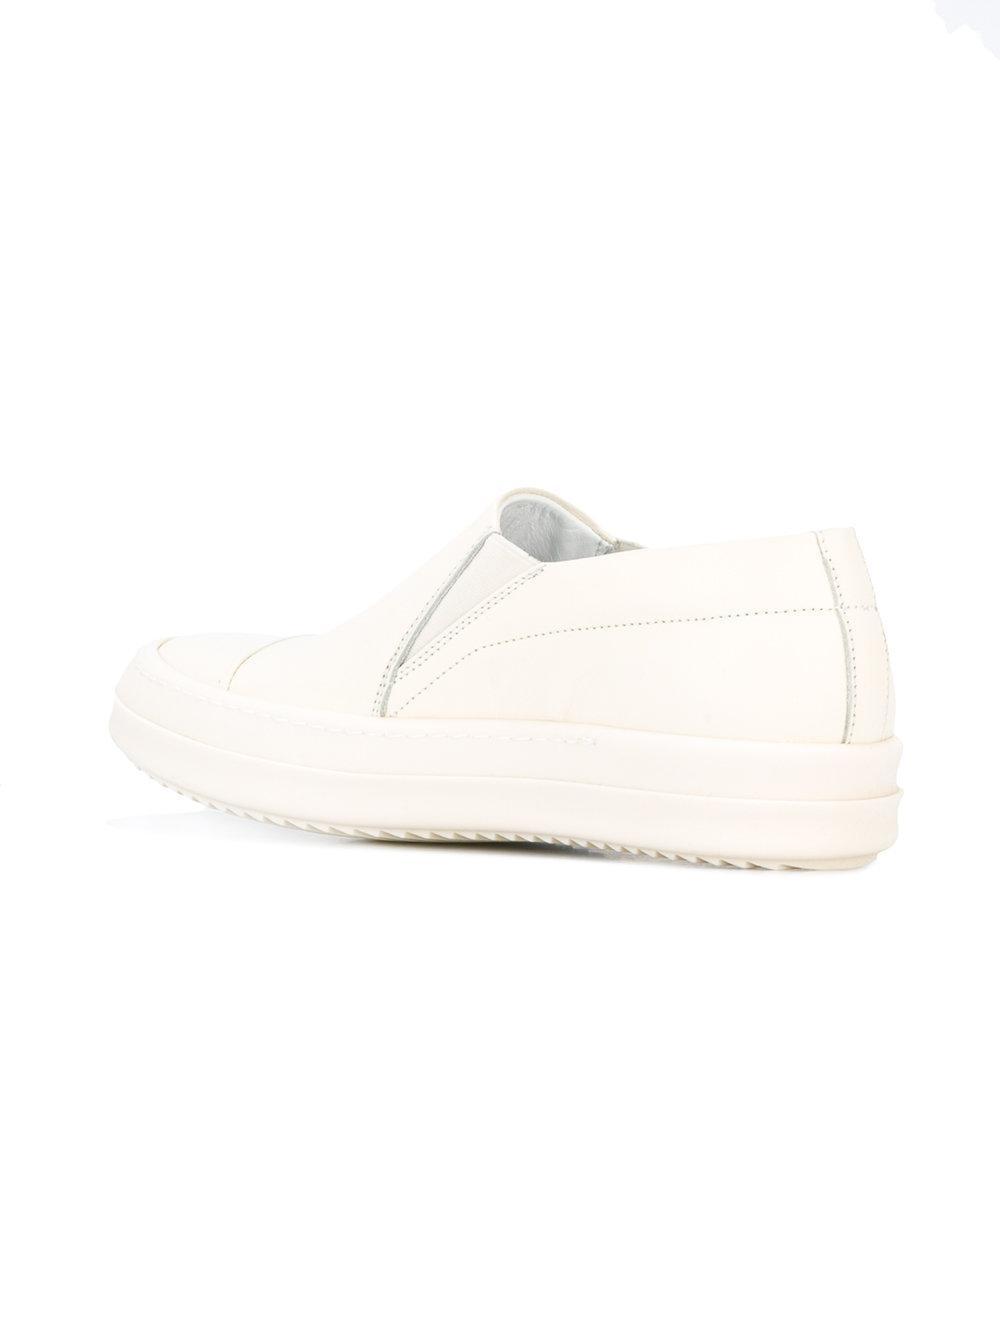 Rick Owens White Intrecciato Dodger Slip-On Sneakers